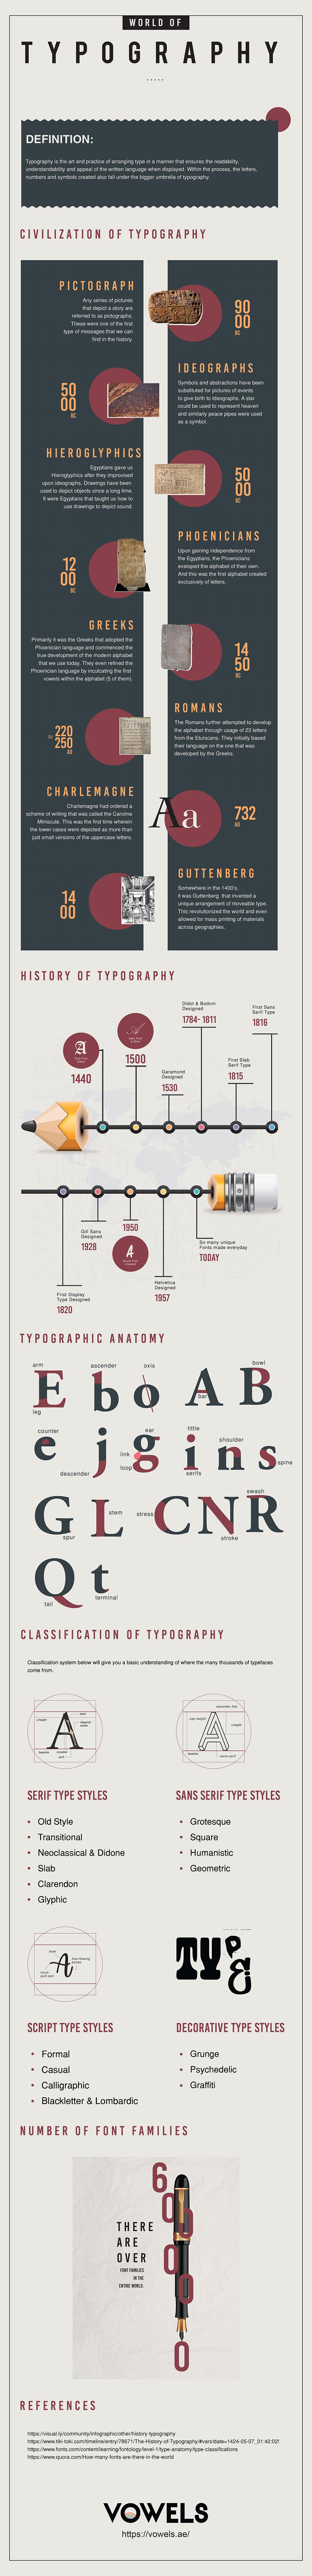 World of Typography